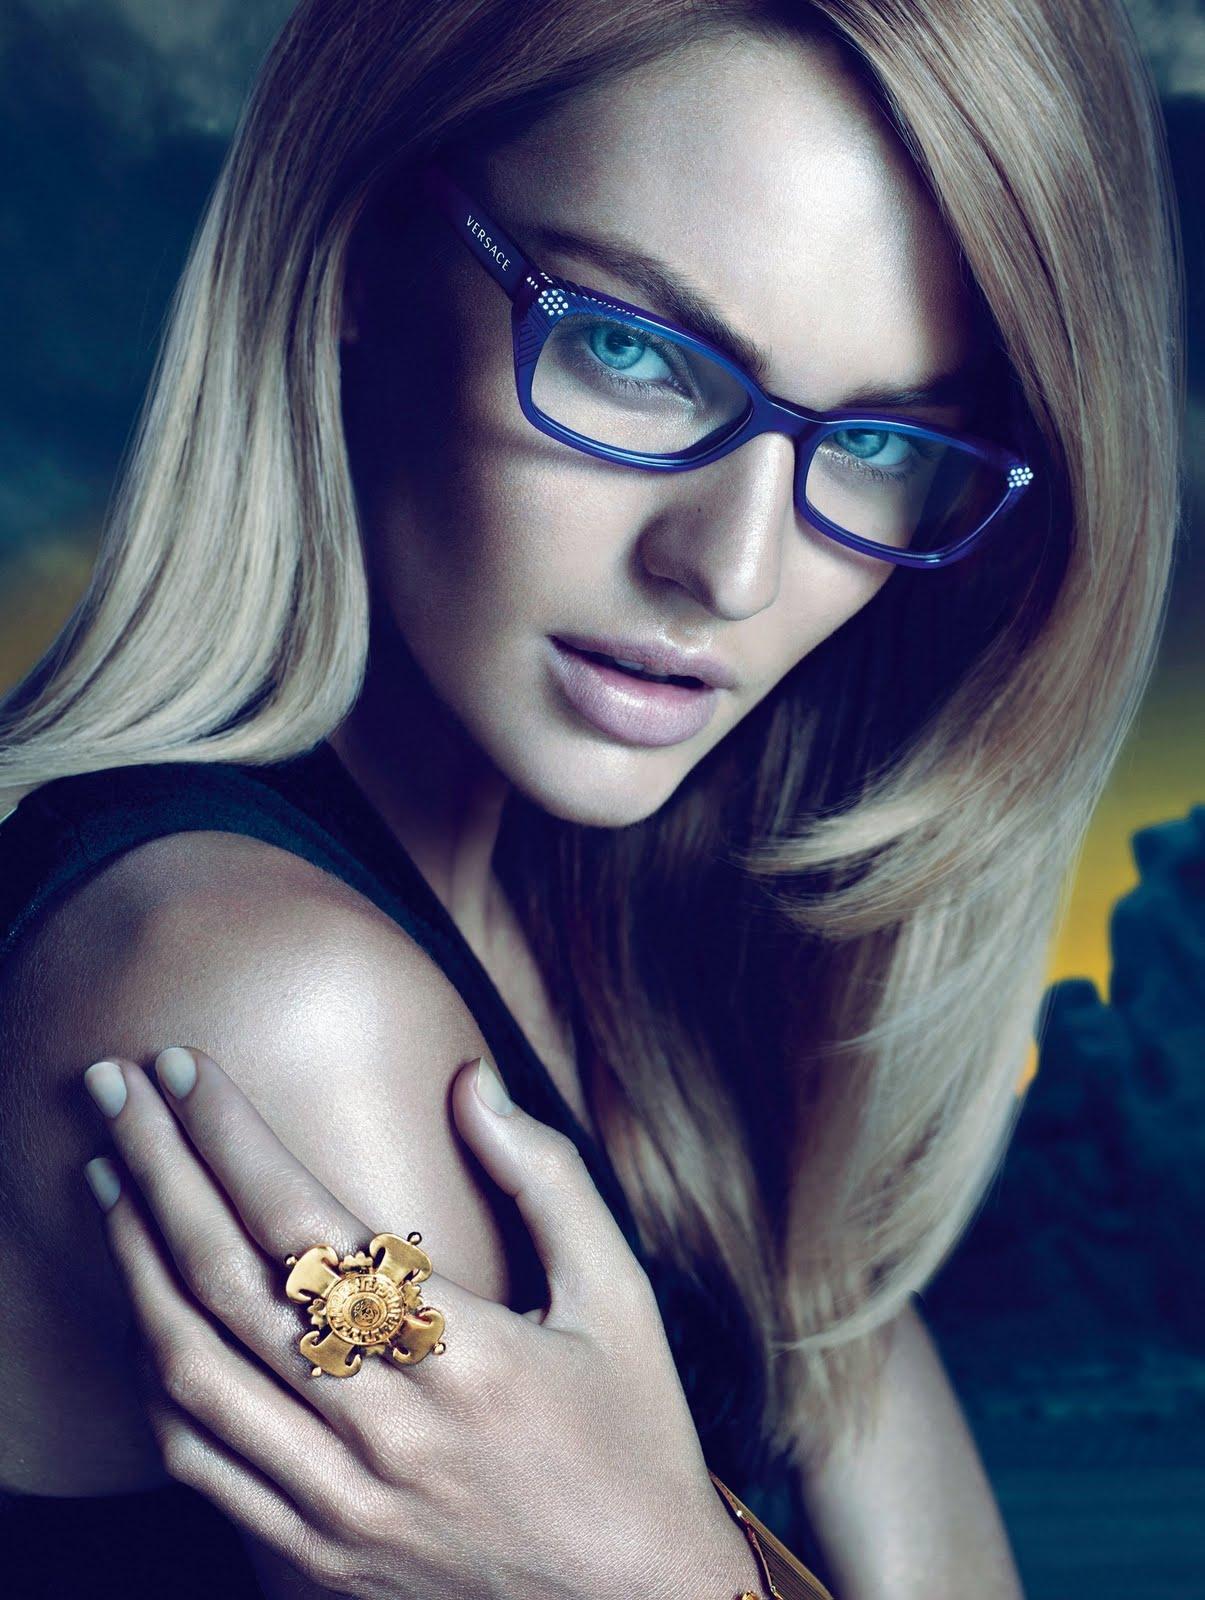 Fig. 10 - Candice Swanepoel for Versace Eyewear